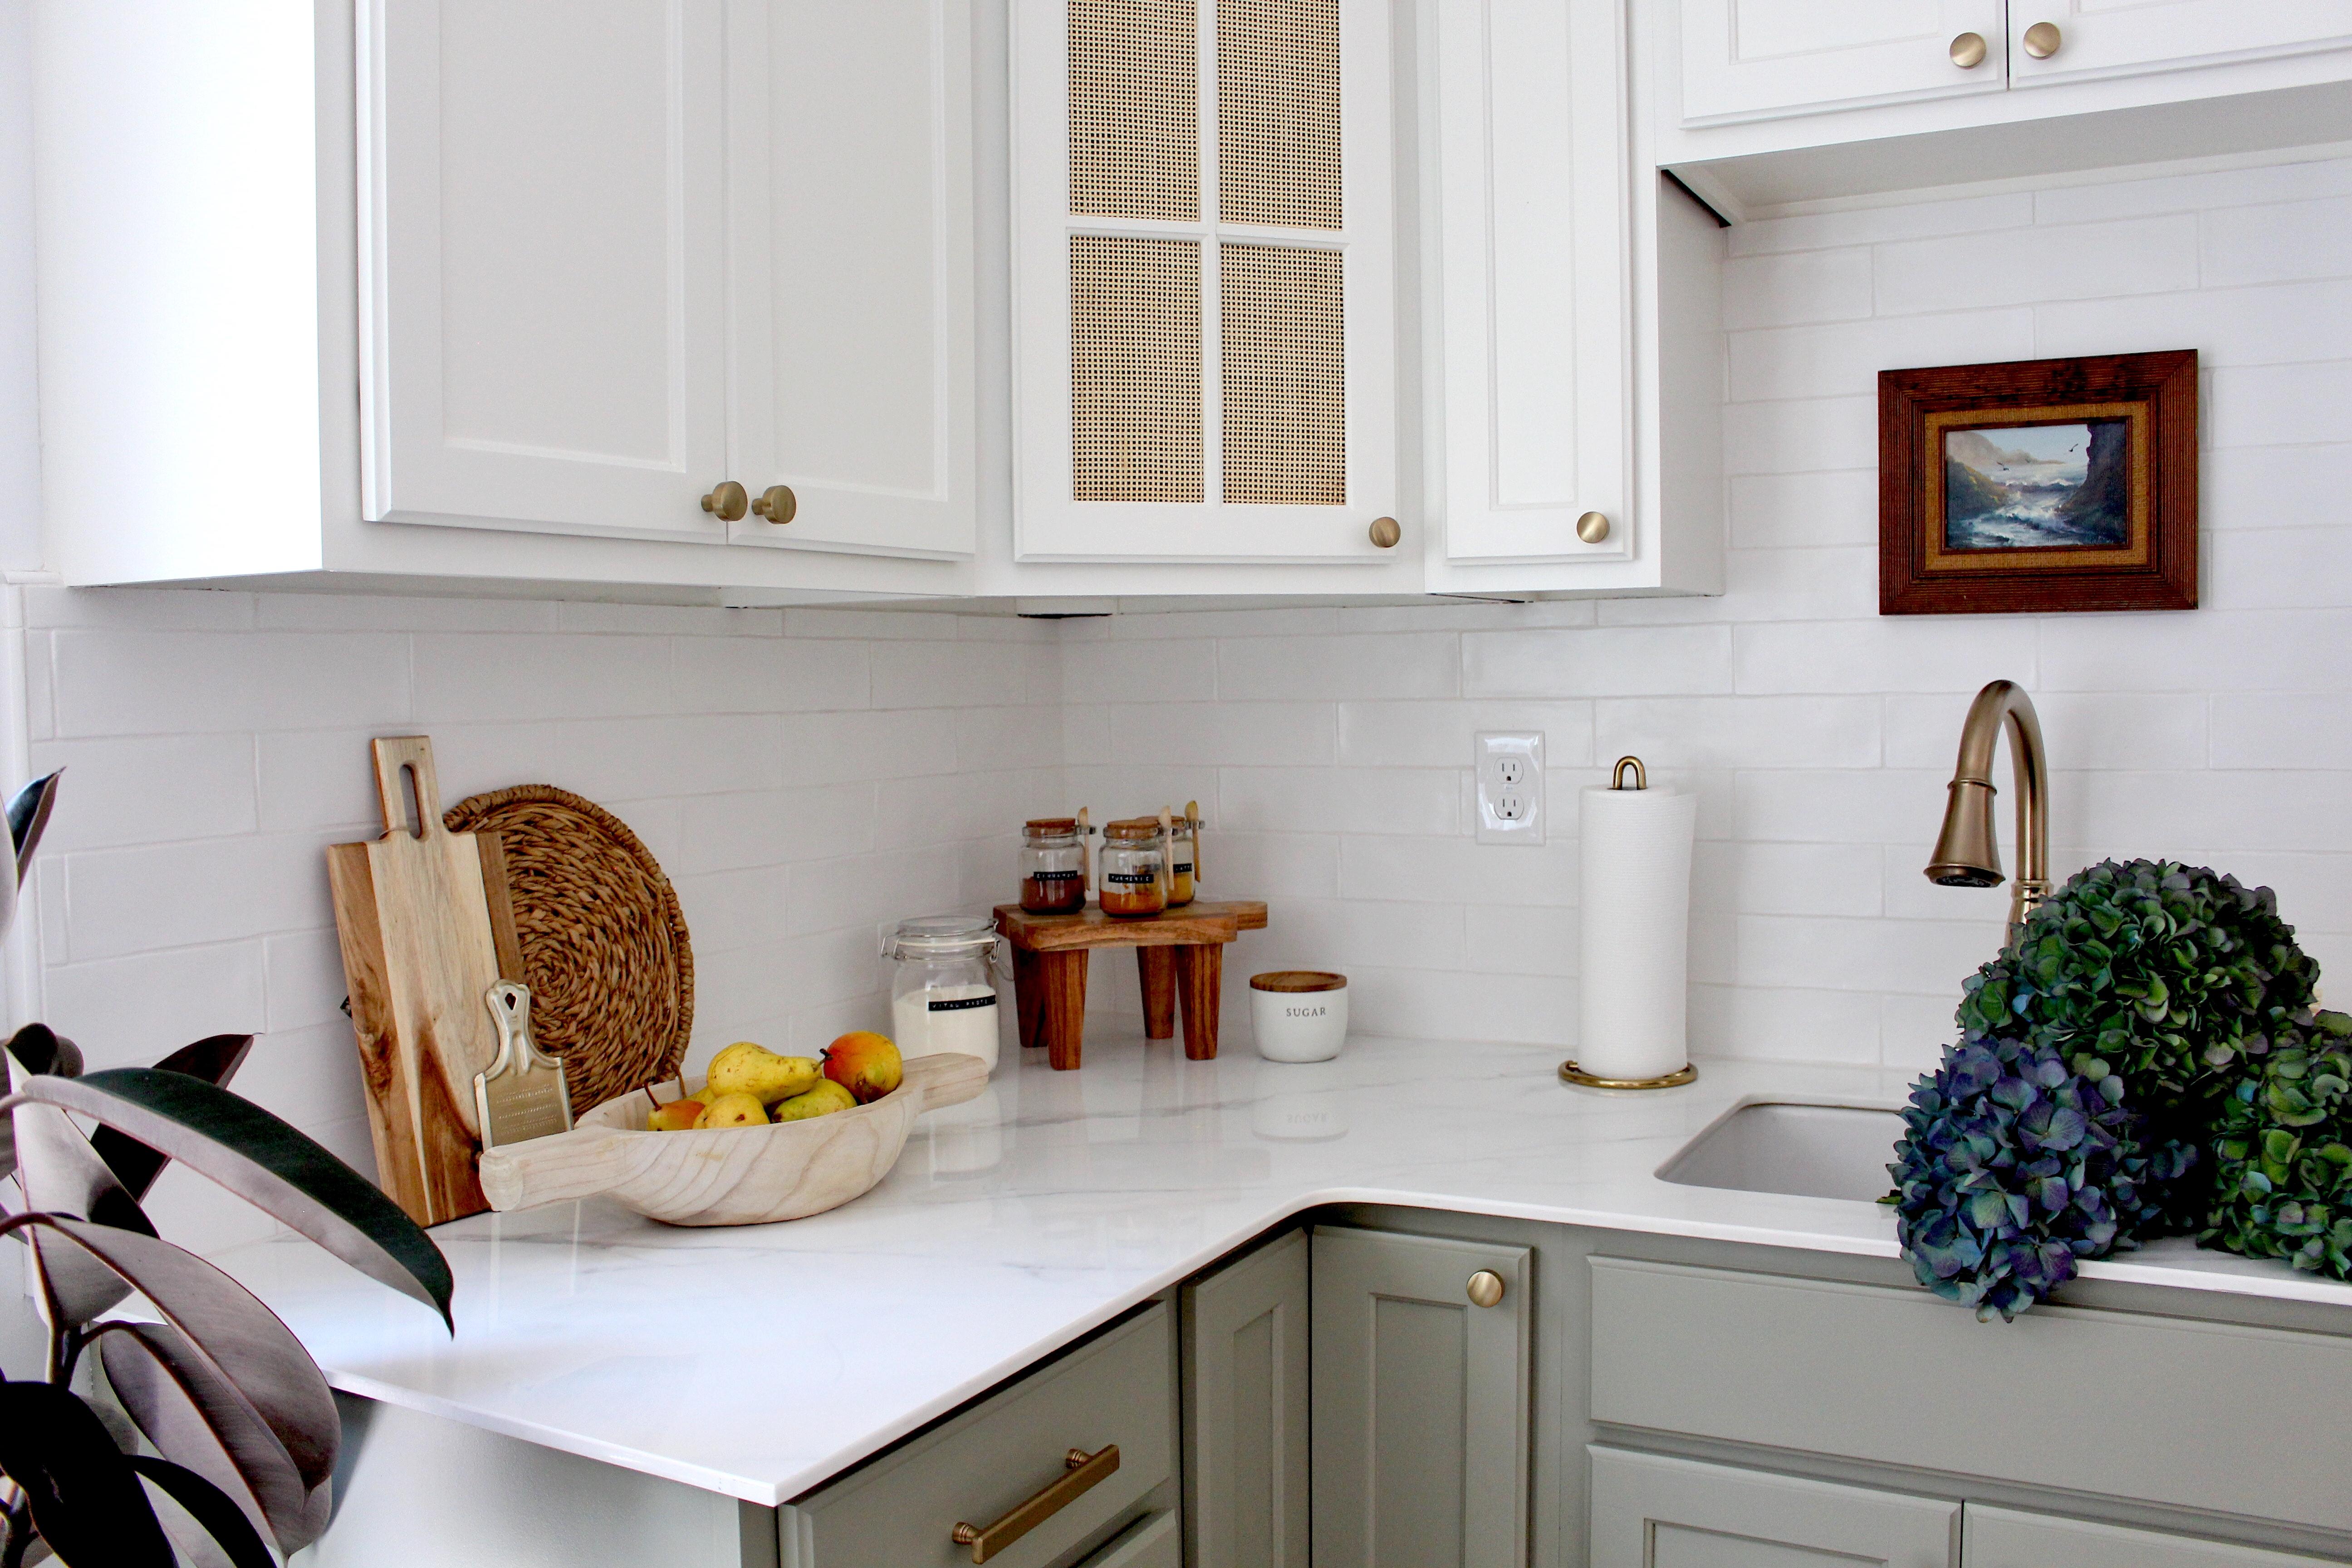 White Porcelain Countertop Kitchen